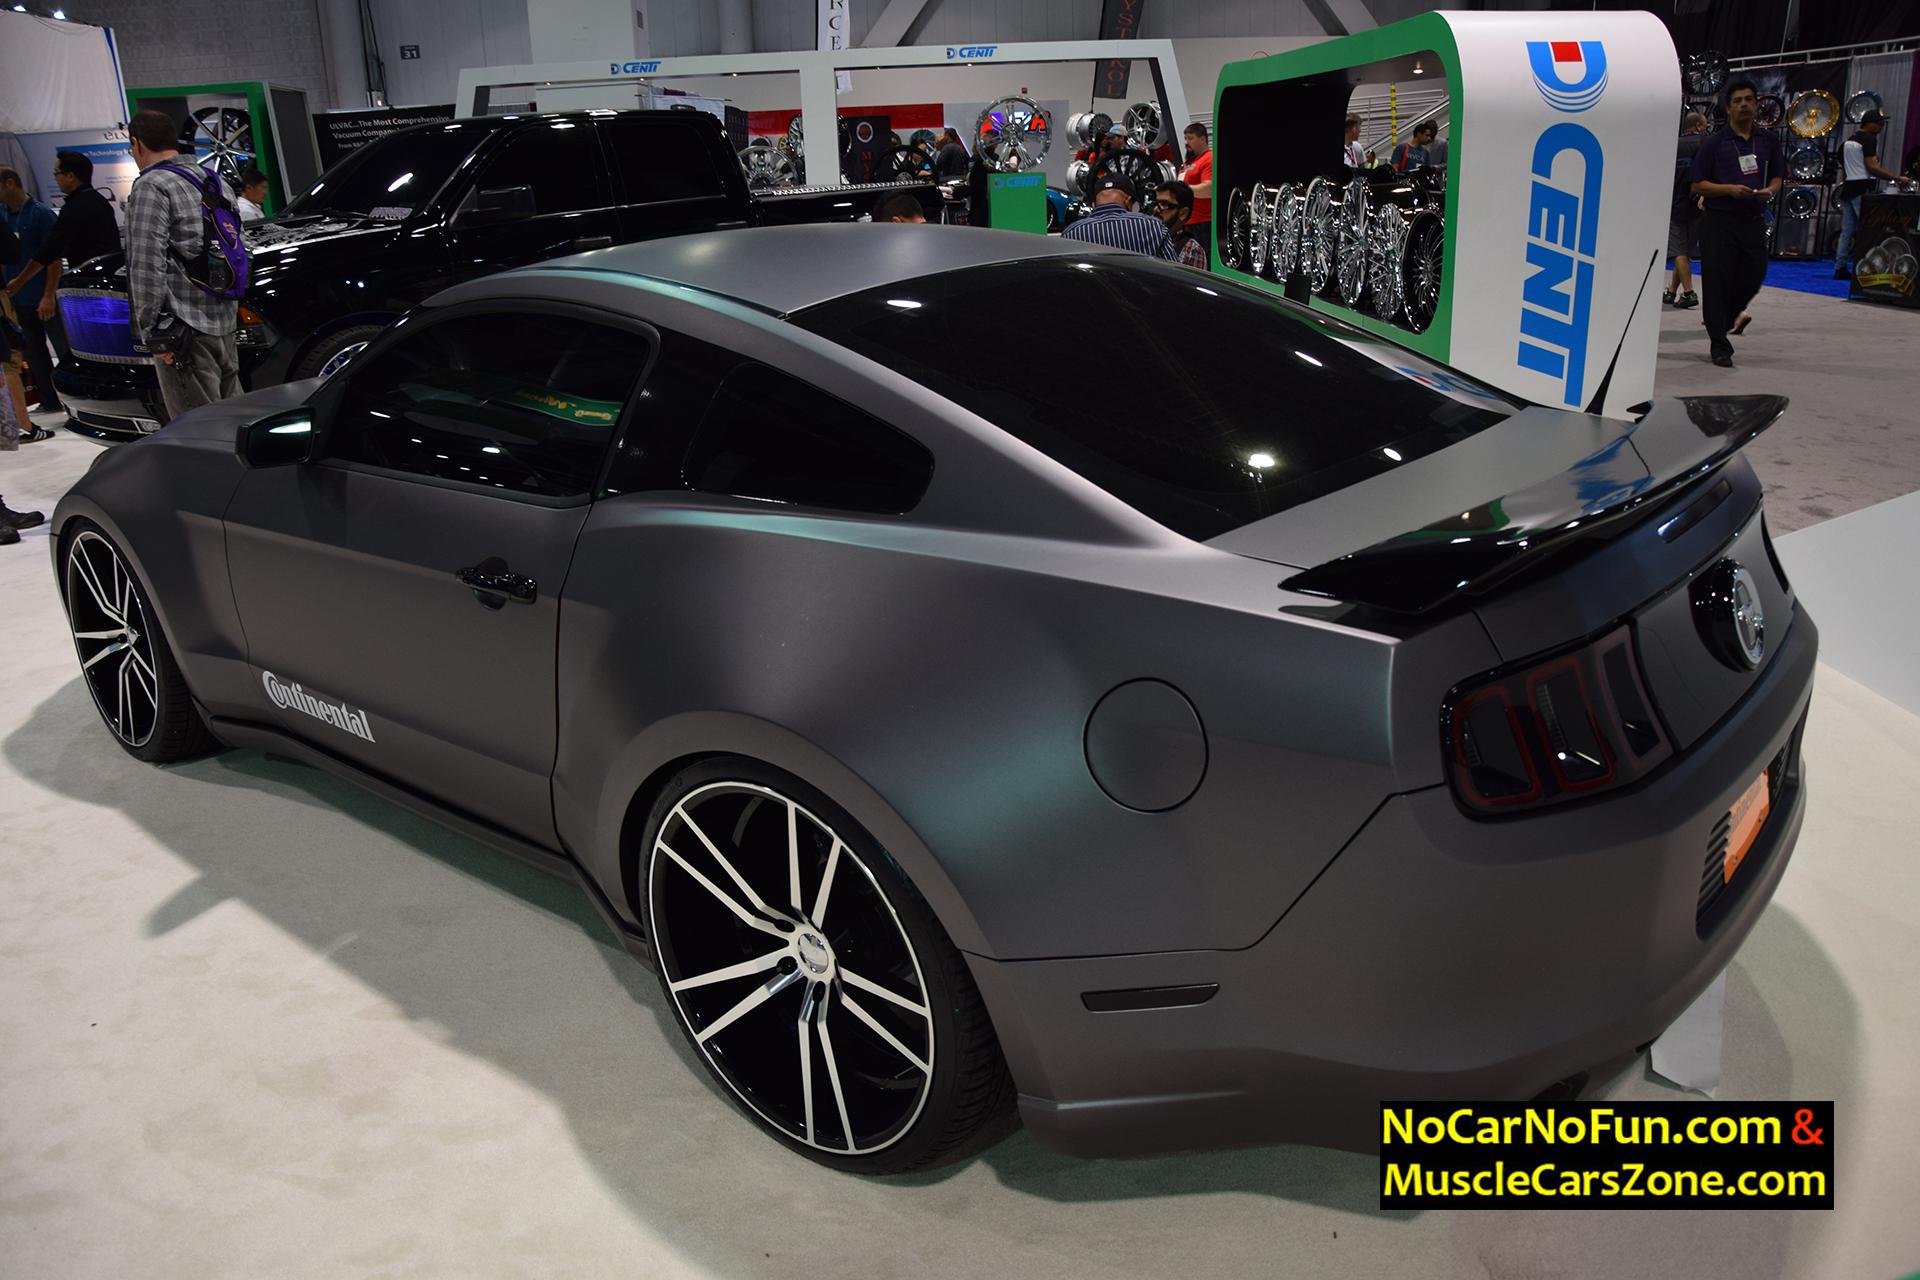 Ford Mustang Dark Gray Wrapped 2015 Sema Motor Show 4